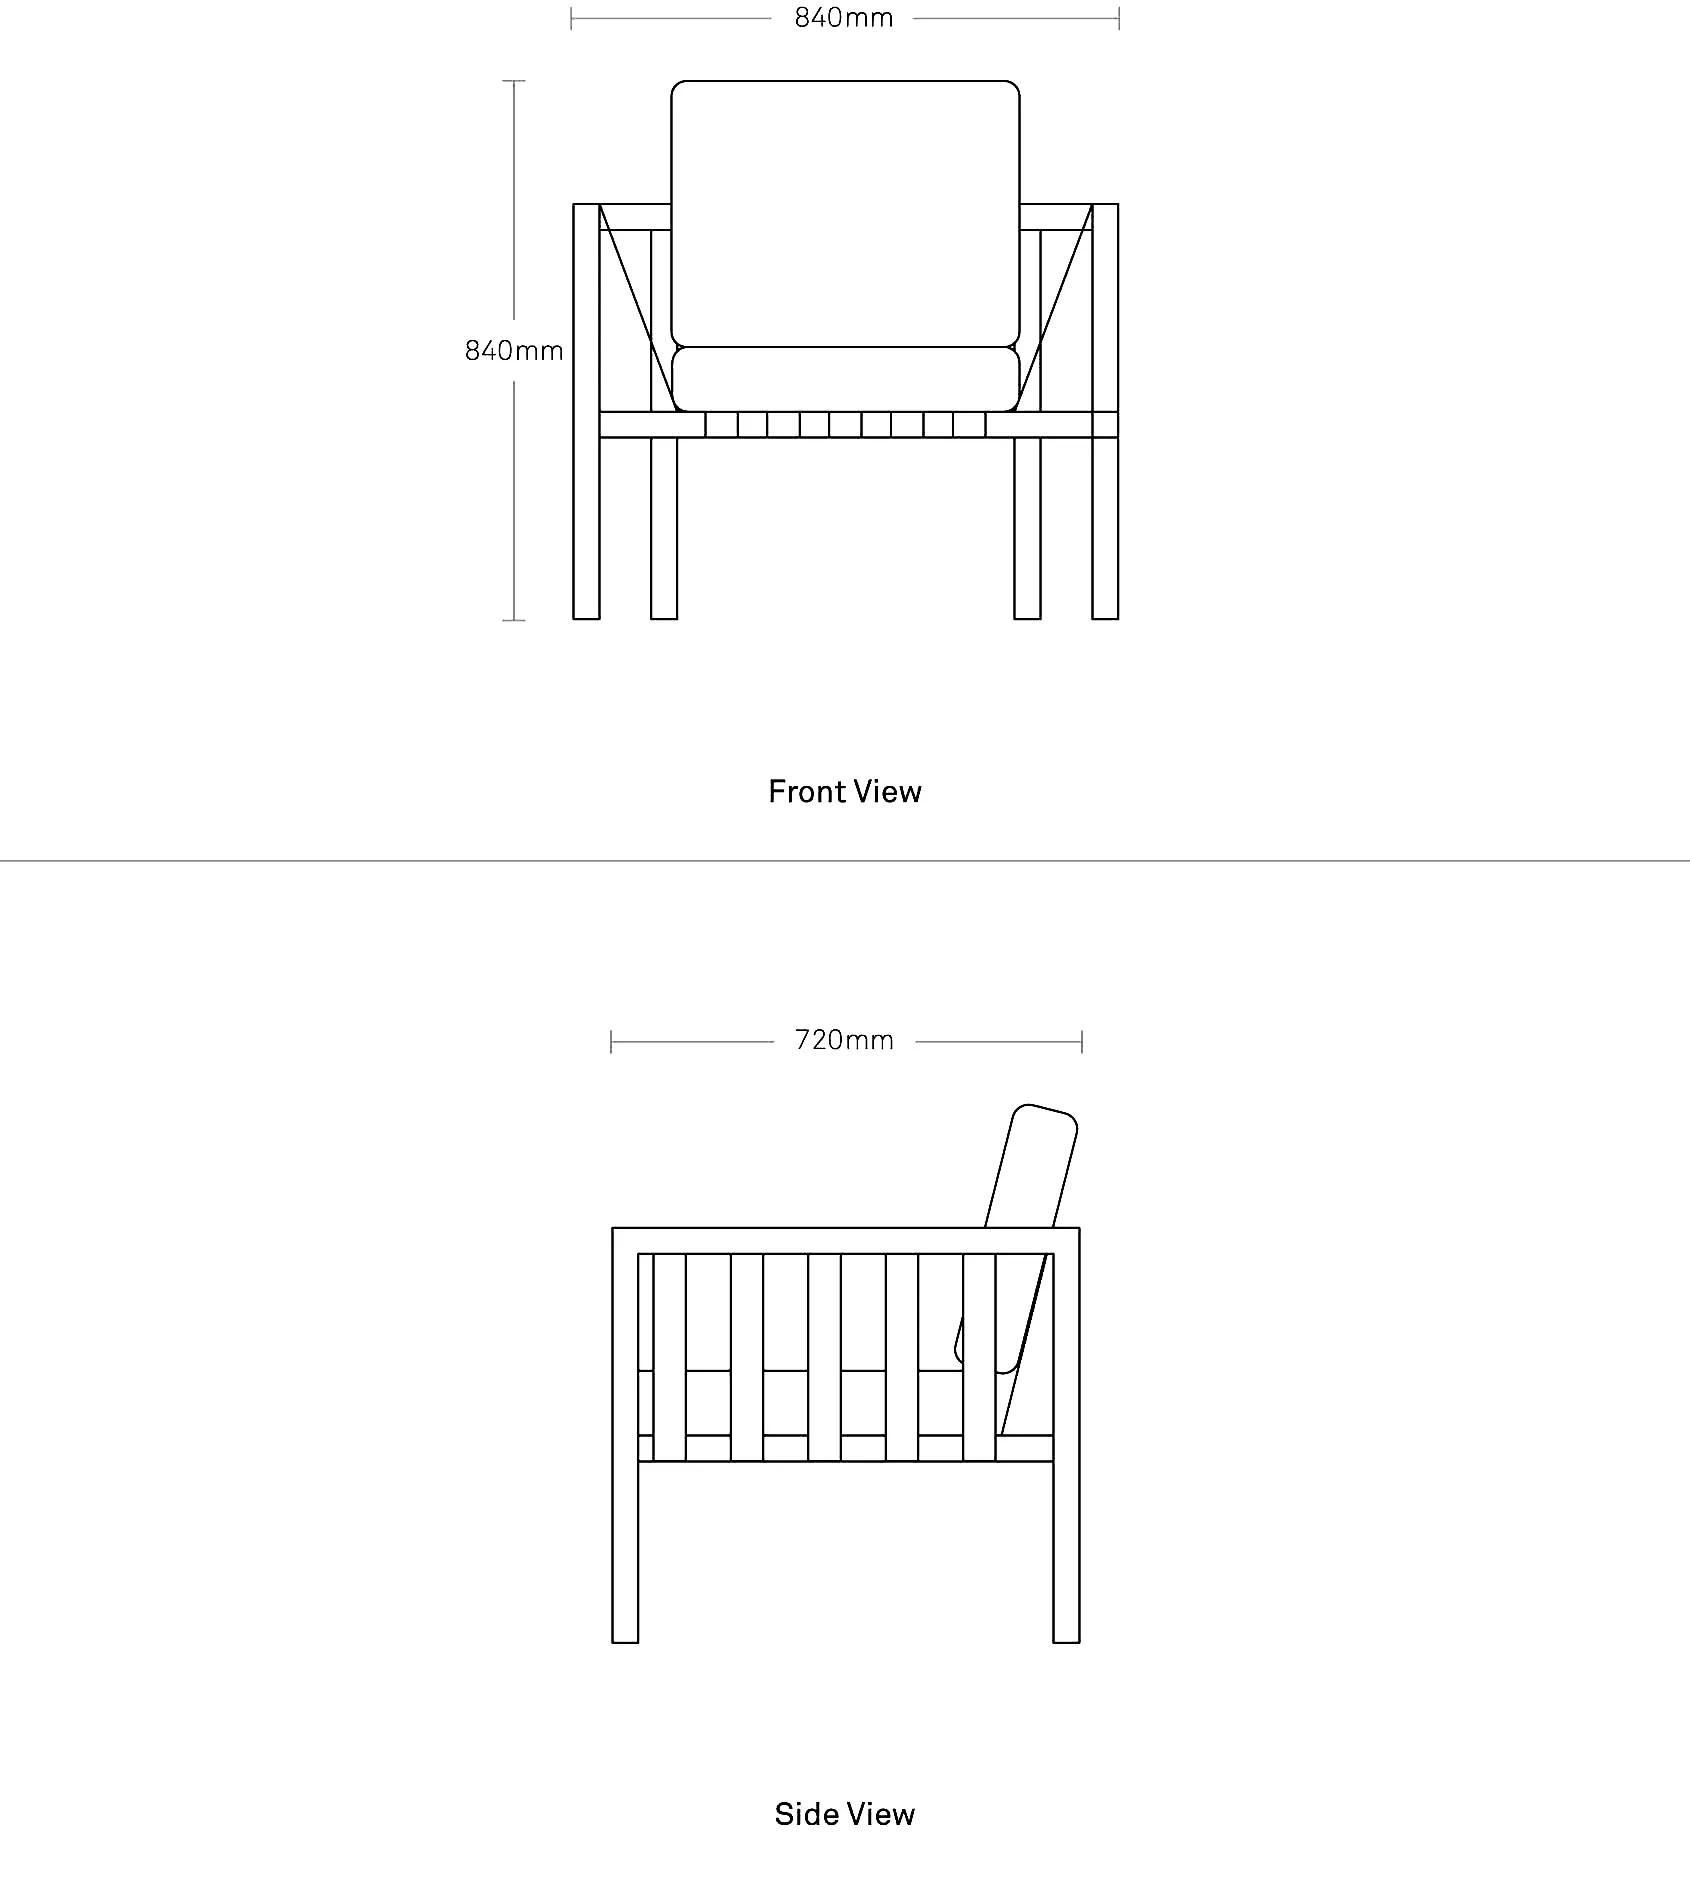 lounge chair dimensions coleman lumbar quattro jibe outdoor chairs modern furniture